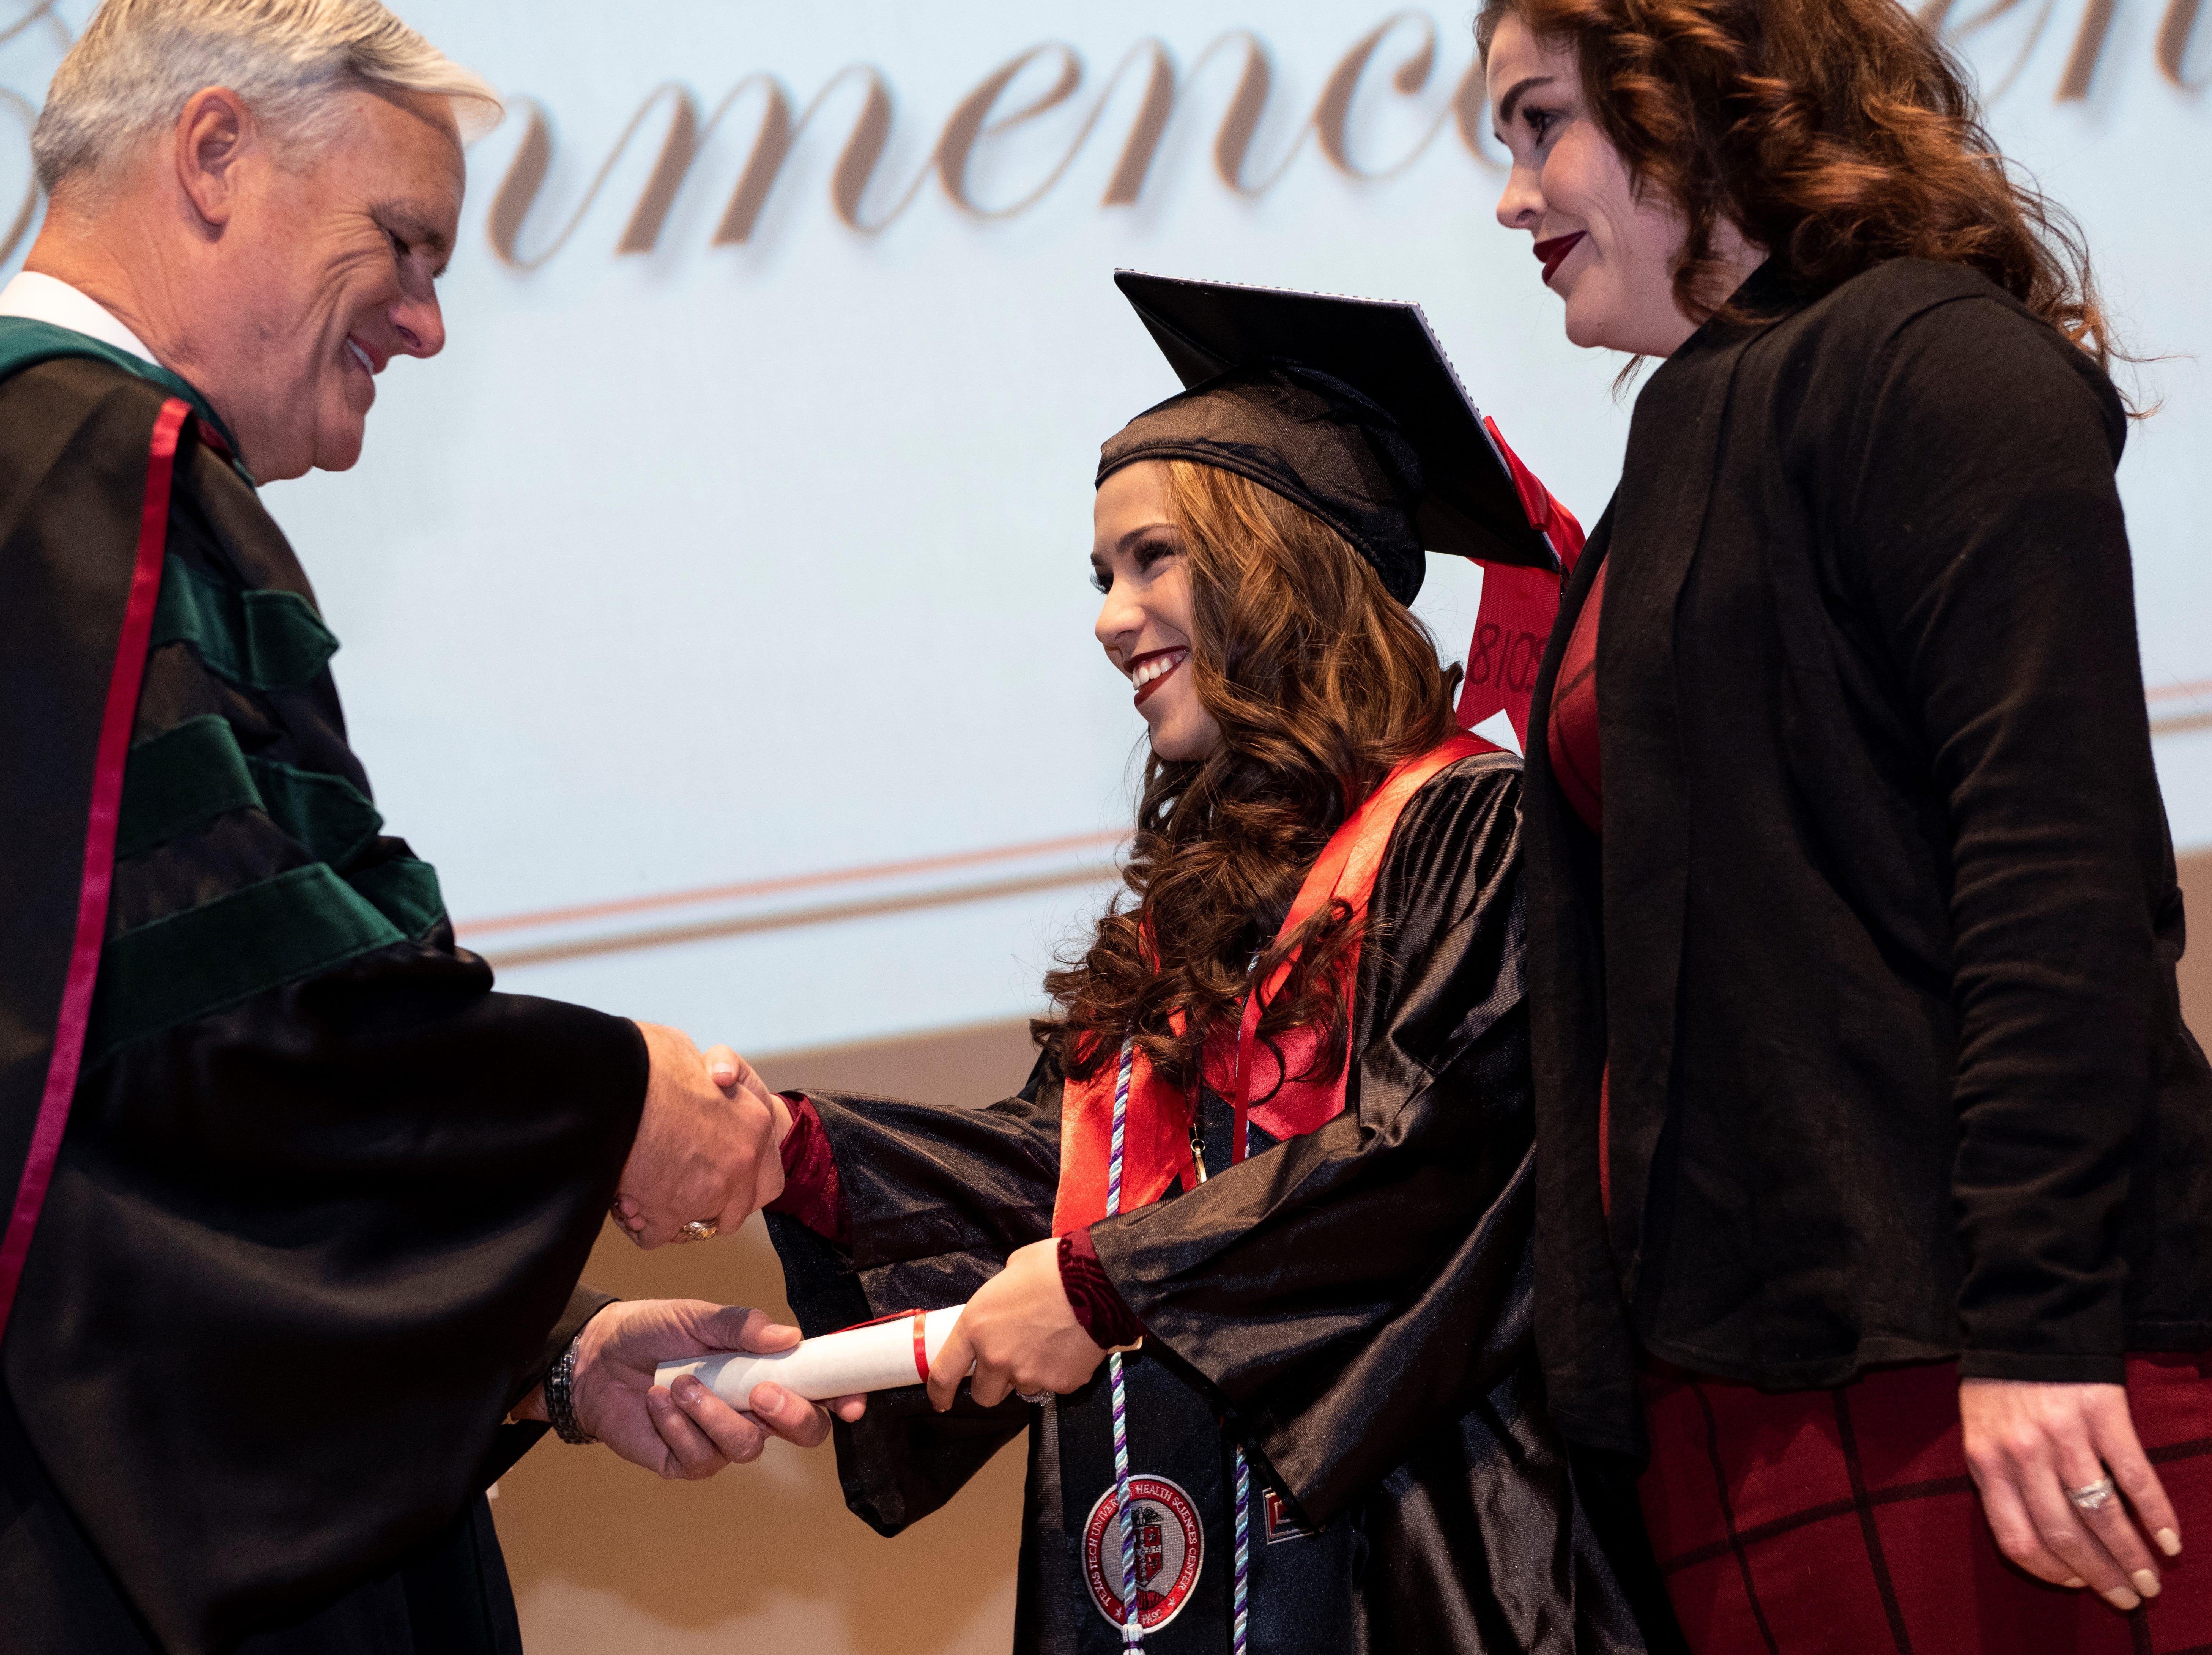 Texas Tech's Gayle Greve Hunt School of Nursing celebrates commencement, pinning